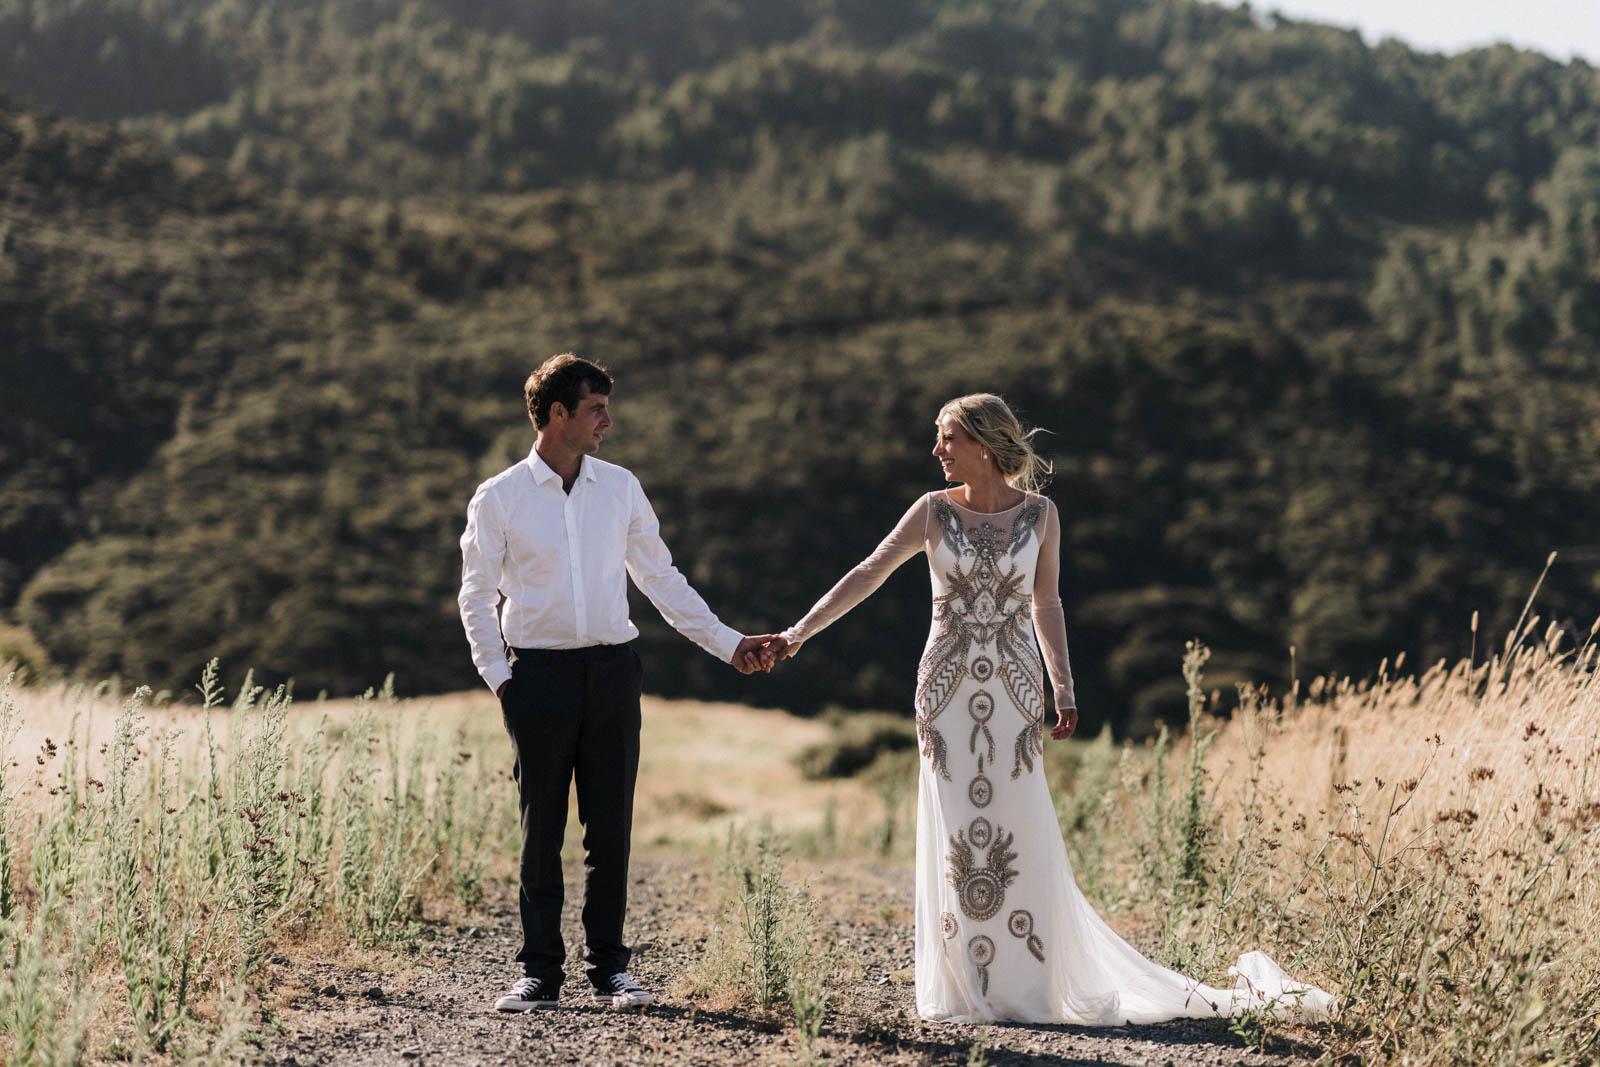 newfound-l-i-coromandel-wedding-photographer-1806-A9_04174